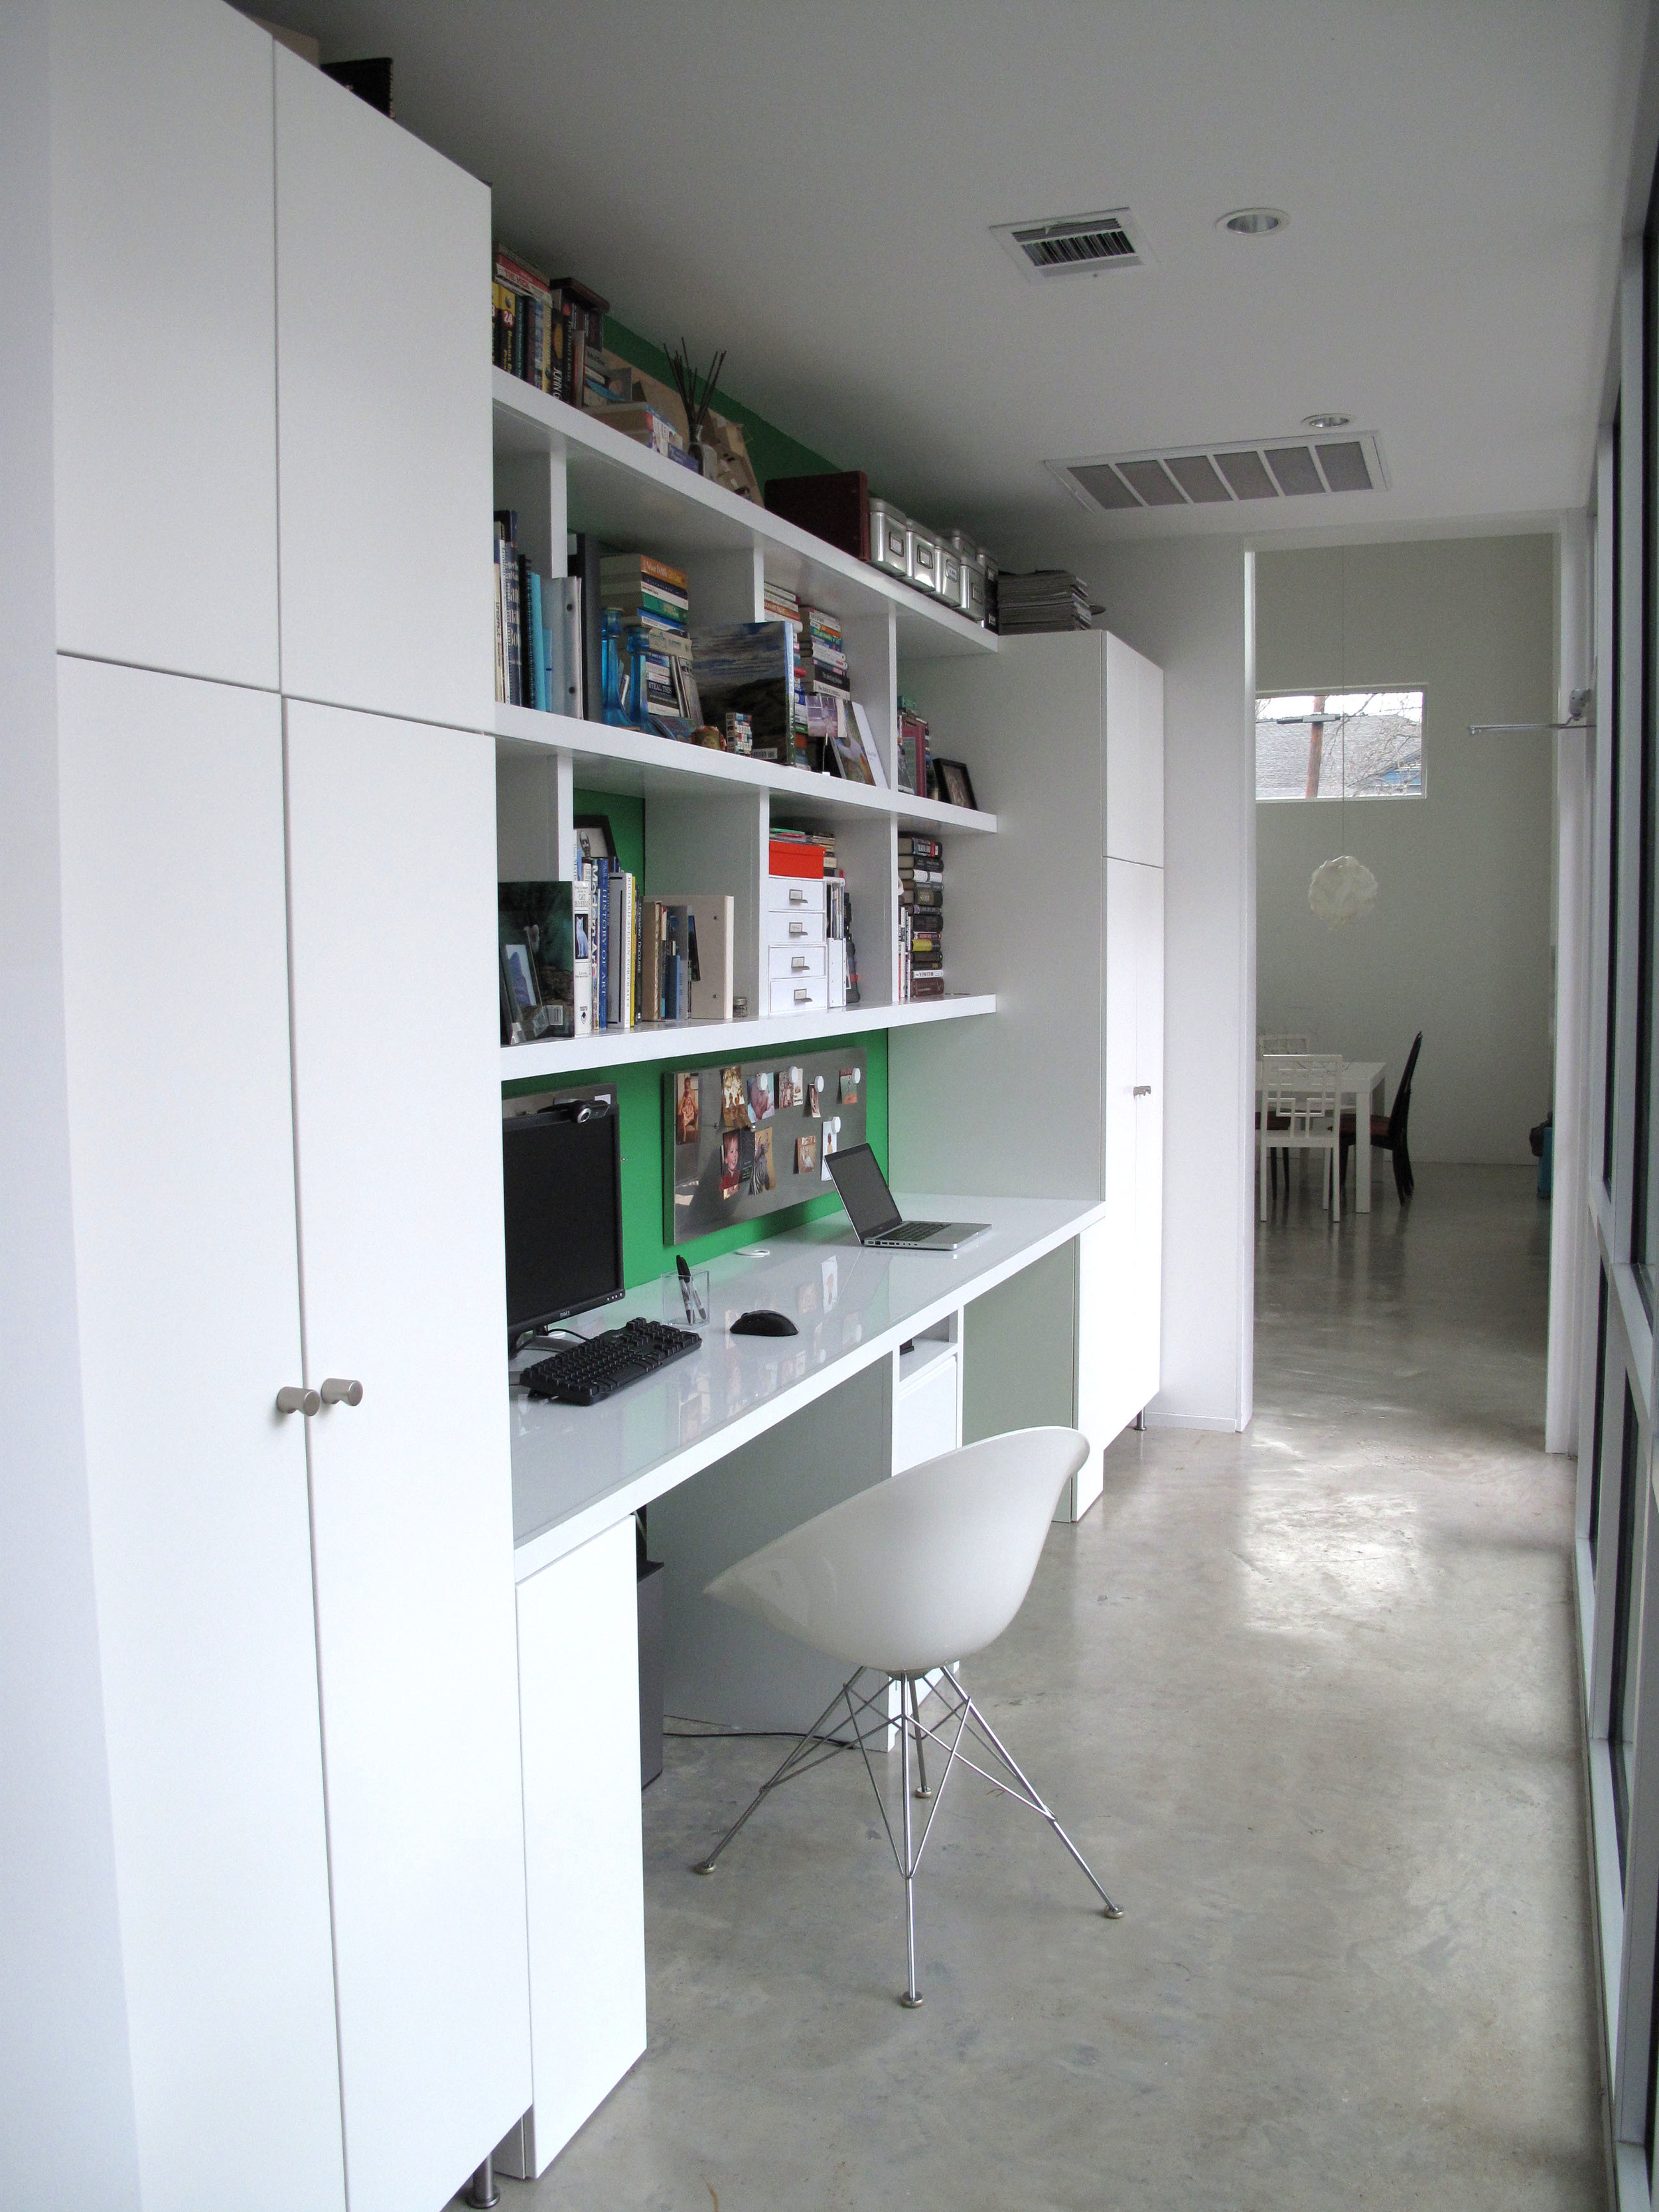 2309-Desk copy.jpg